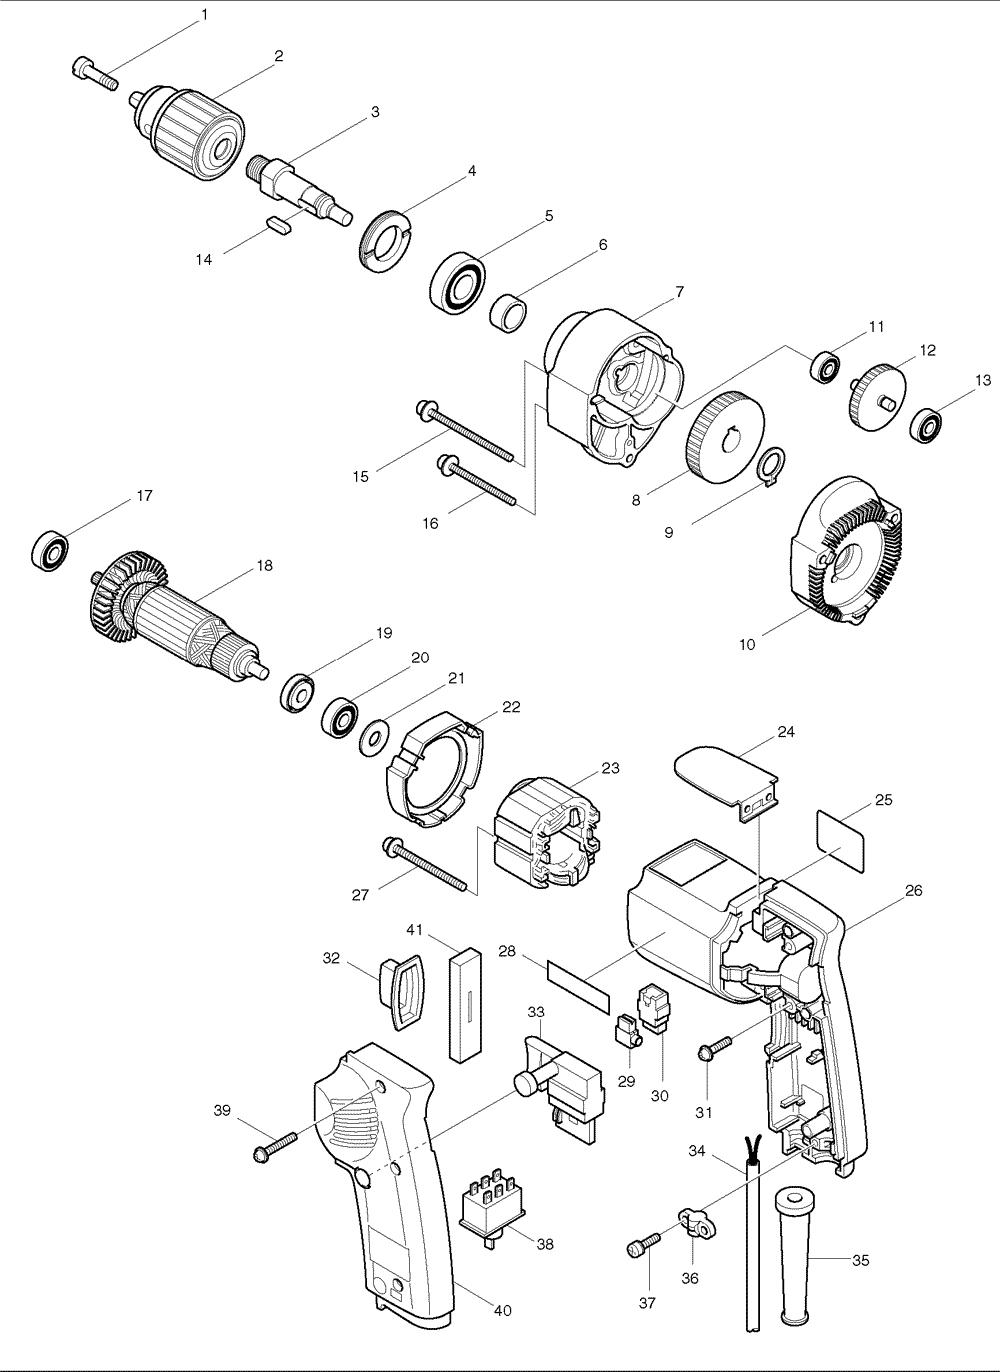 makita electric drill wiring diagram 36 wiring diagram